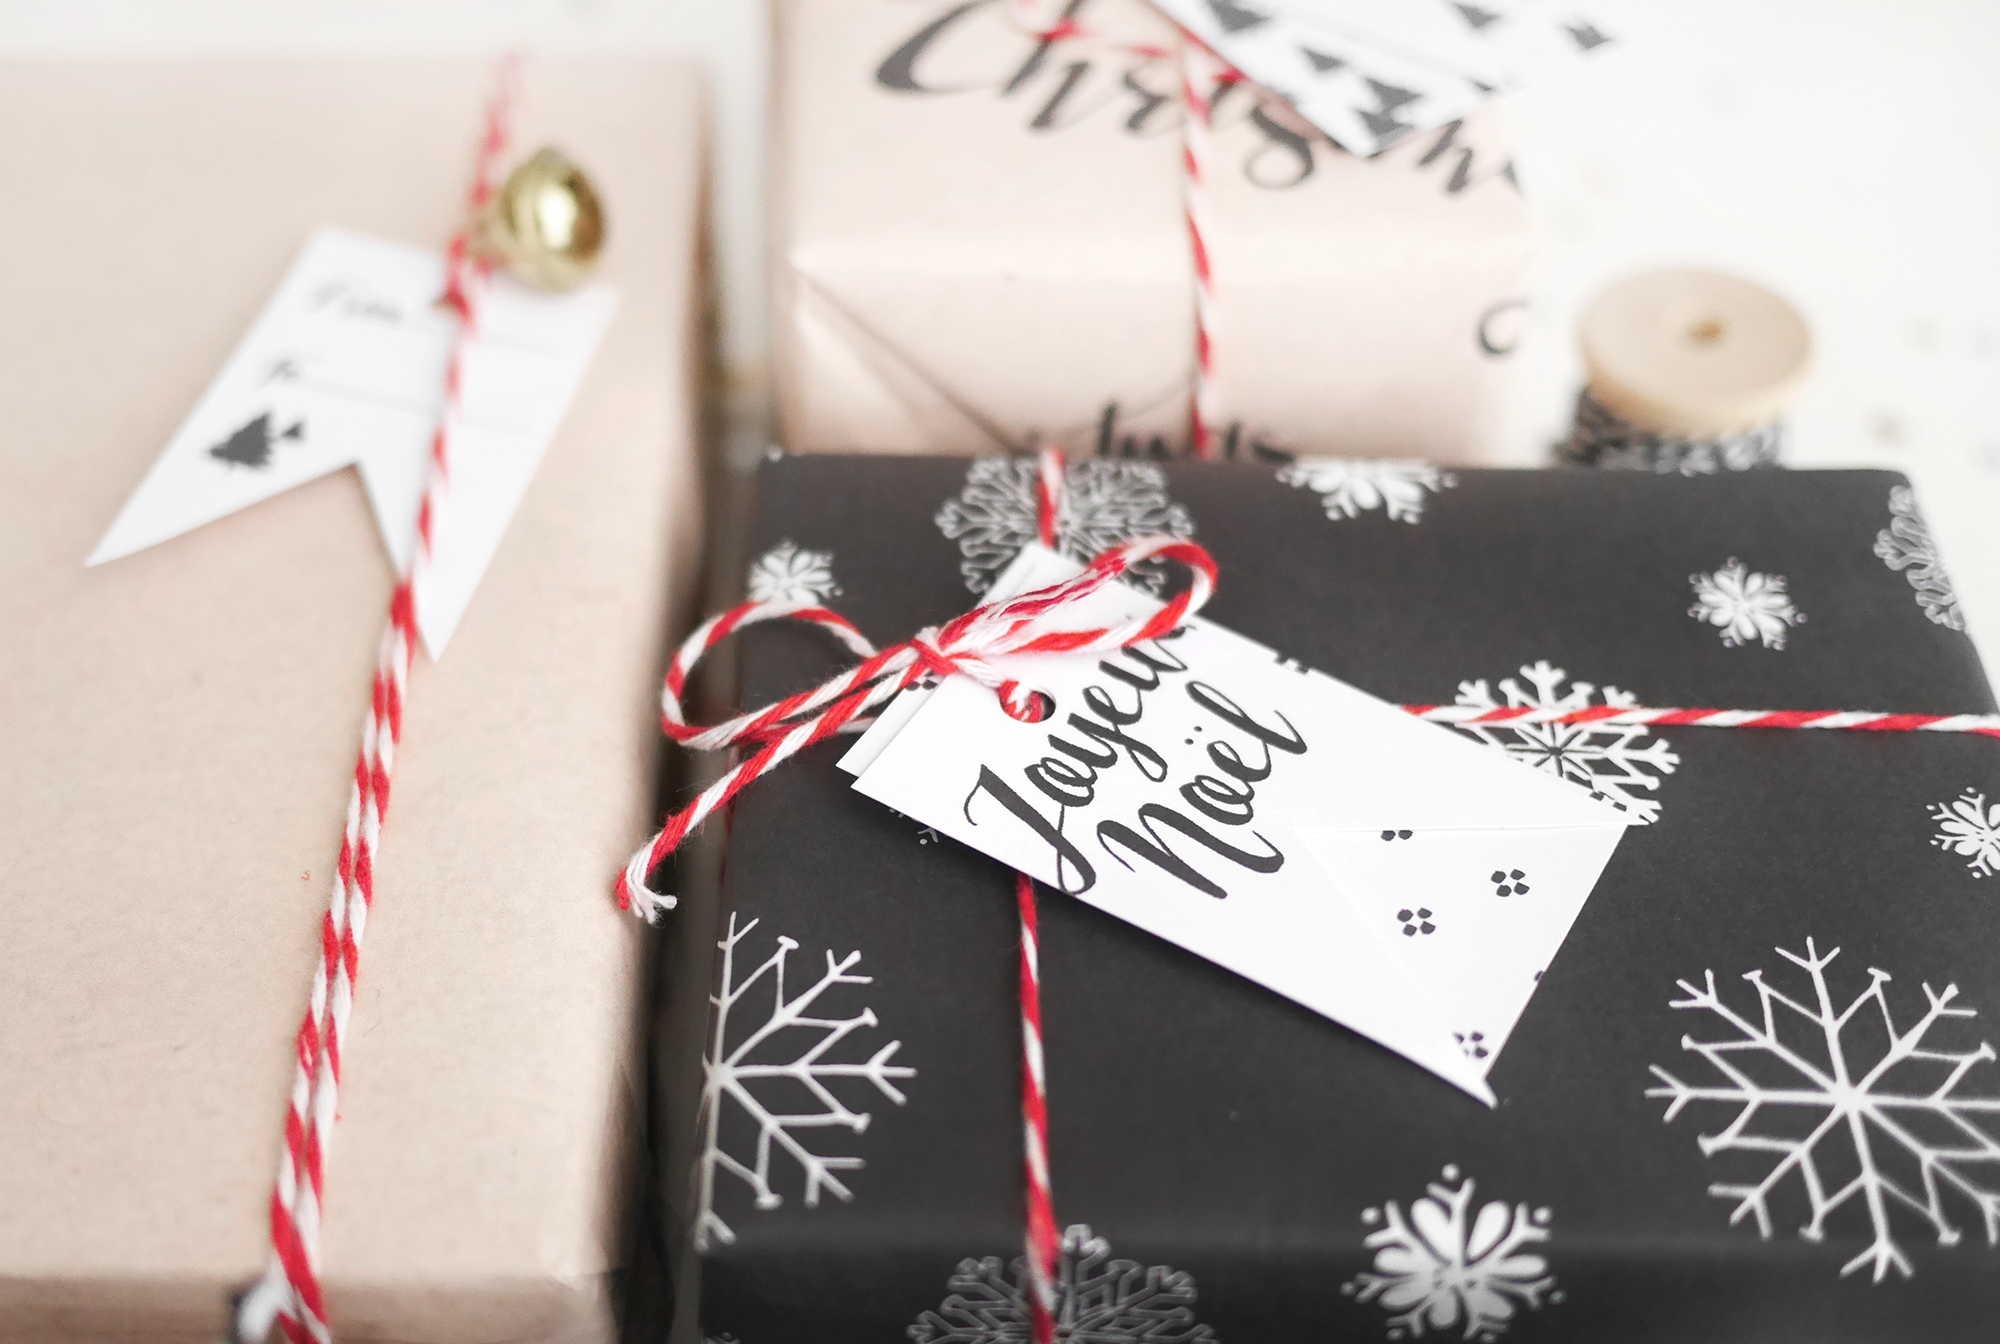 Kerstmis 2016 cadeauverpakking en labels 2